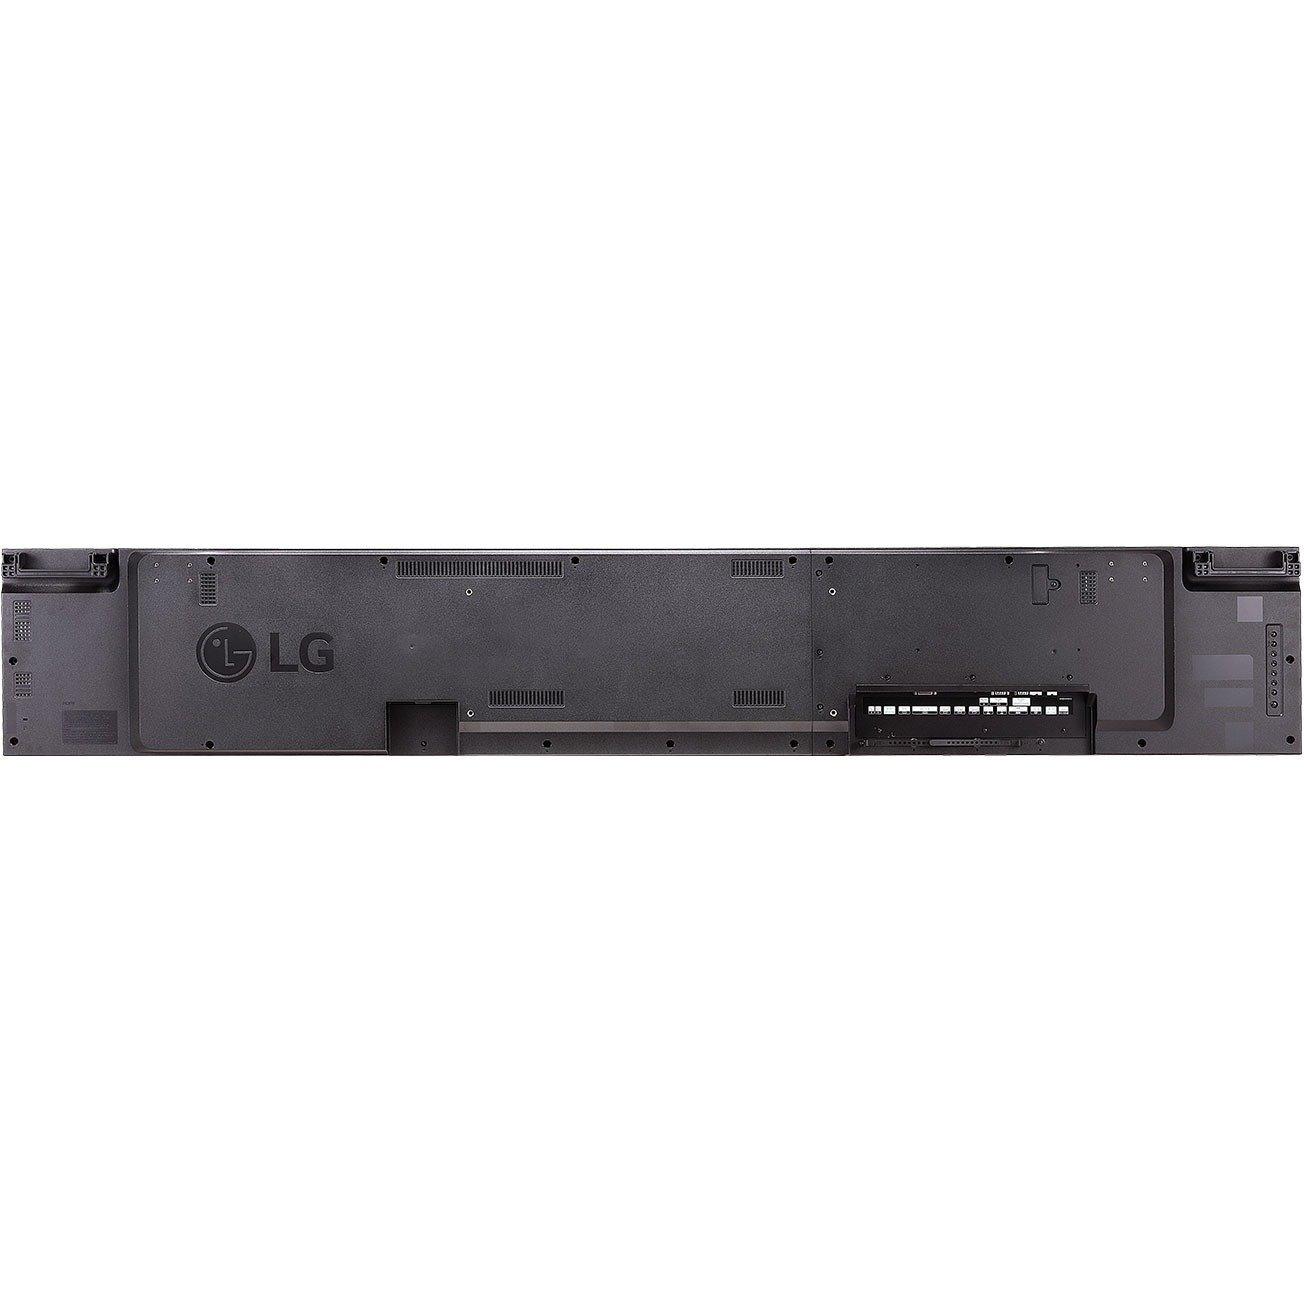 "LG 86BH5C 218.4 cm (86"") LCD Digital Signage Display"